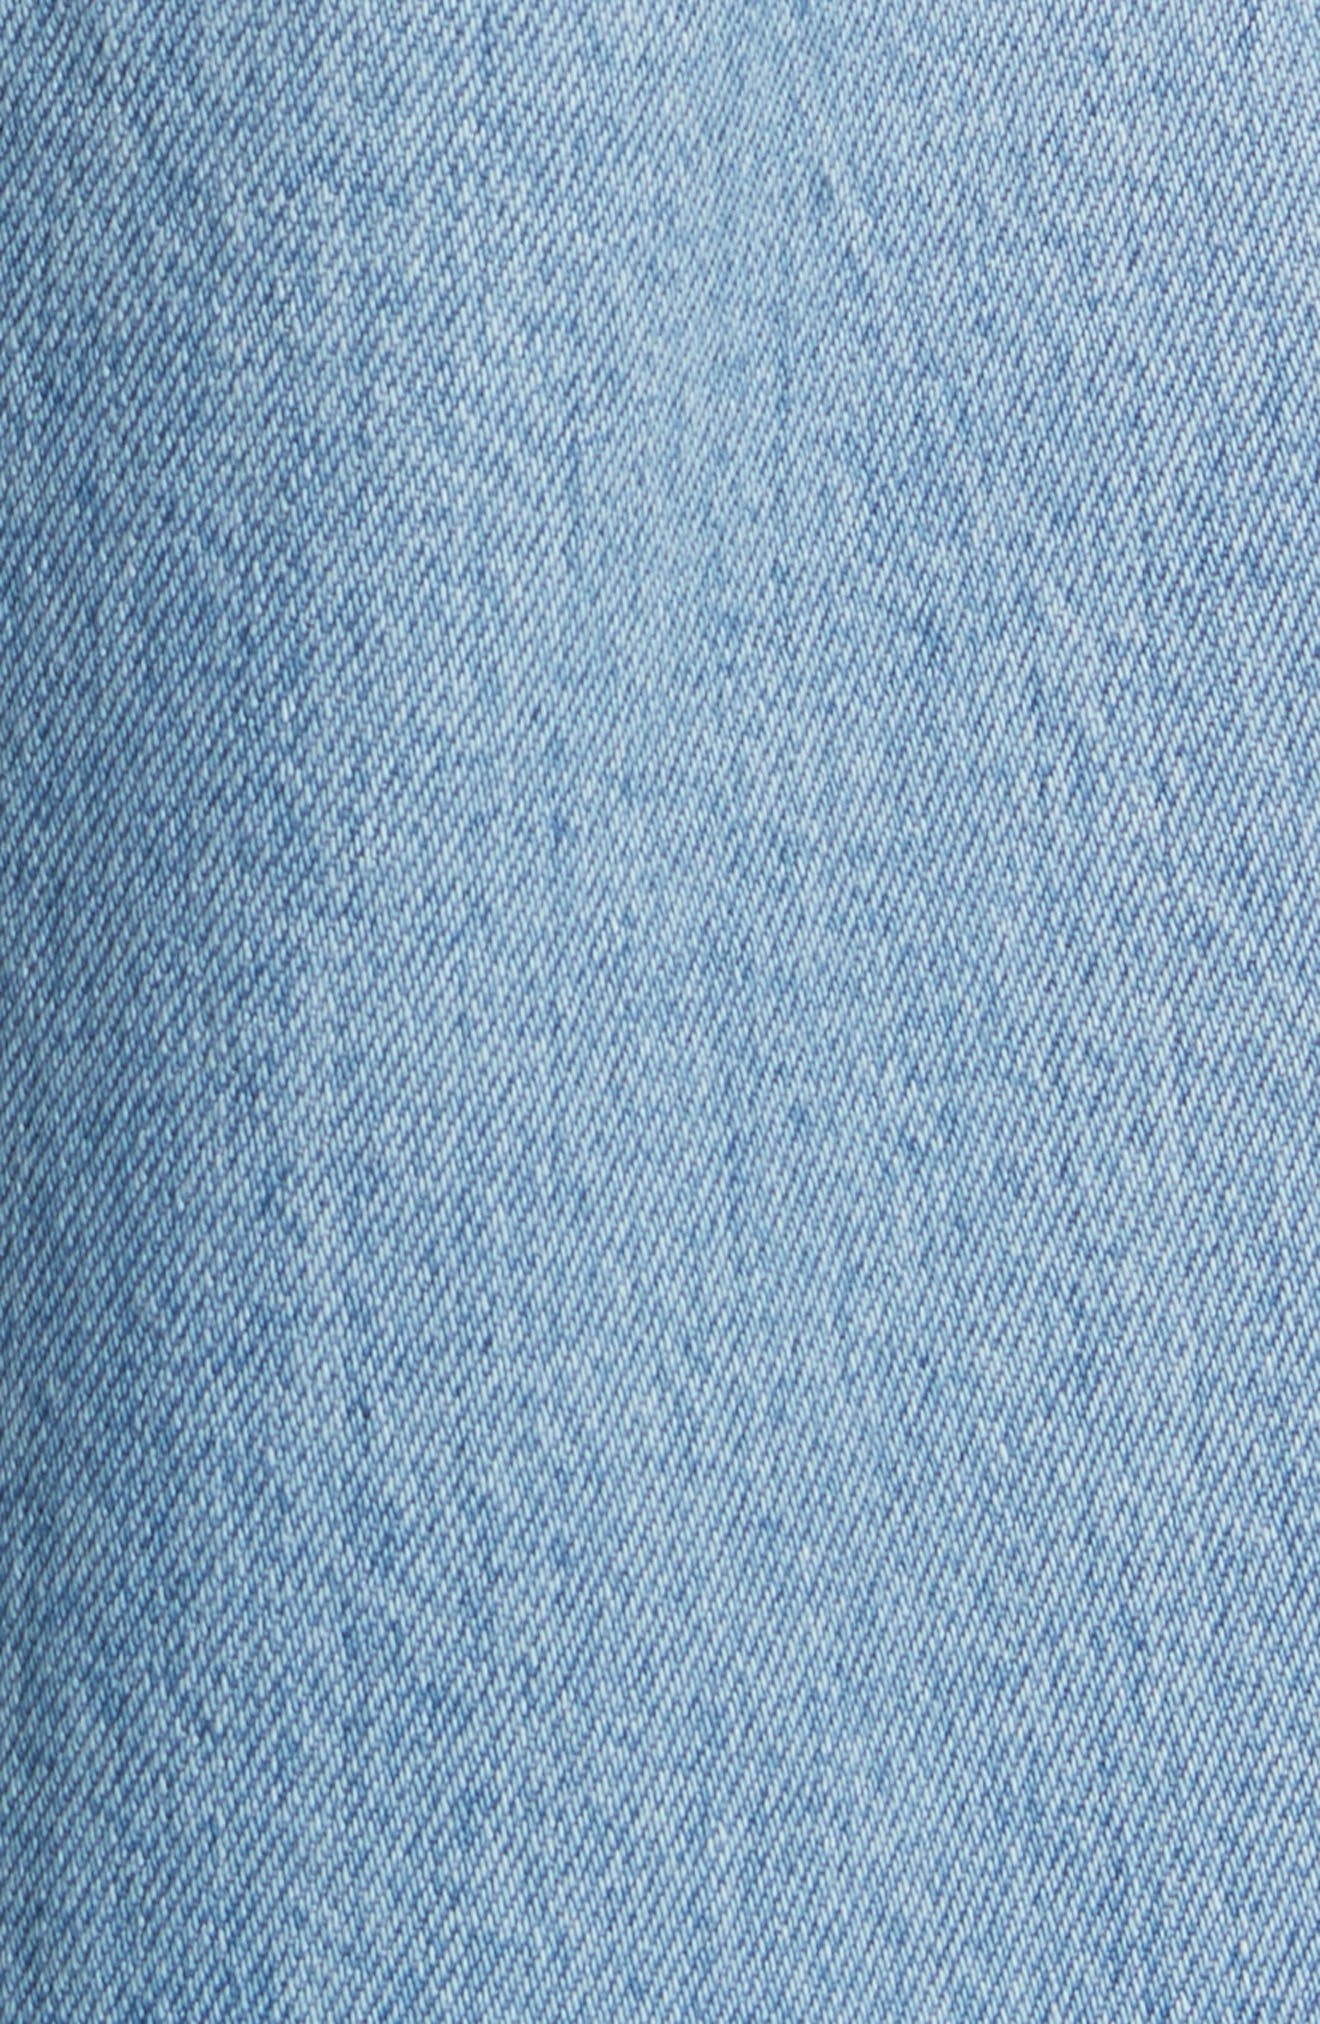 Wide Leg Carpenter Jeans,                             Alternate thumbnail 7, color,                             Vintage Indigo